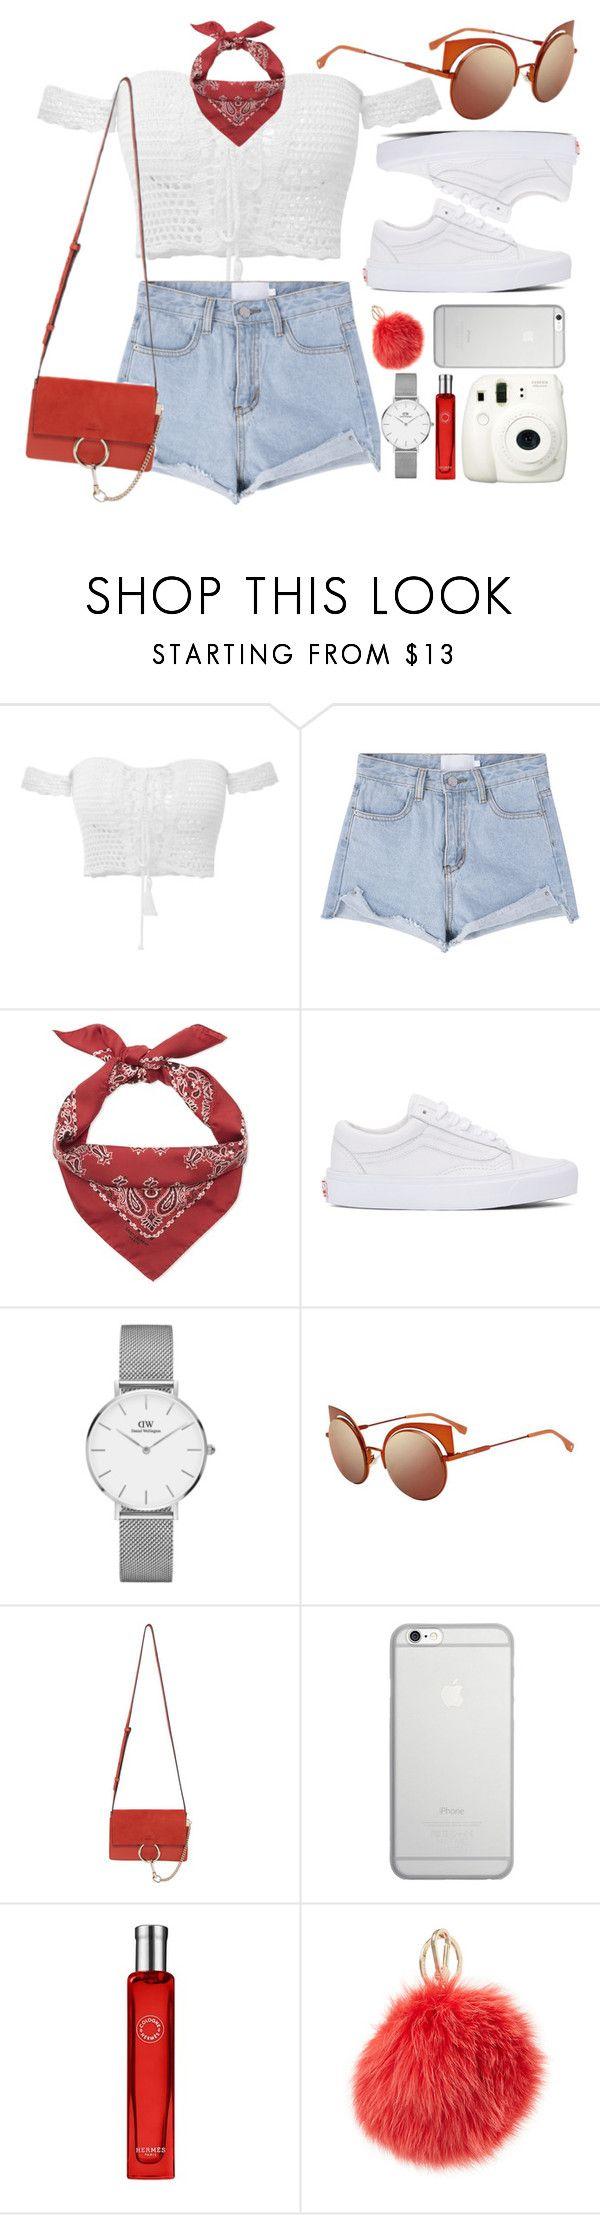 """Summer Girl"" by smartbuyglasses-uk ❤ liked on Polyvore featuring Yves Saint Laurent, Vans, Daniel Wellington, Fendi, Chloé, Native Union, Fuji, Hermès, Furla and white"